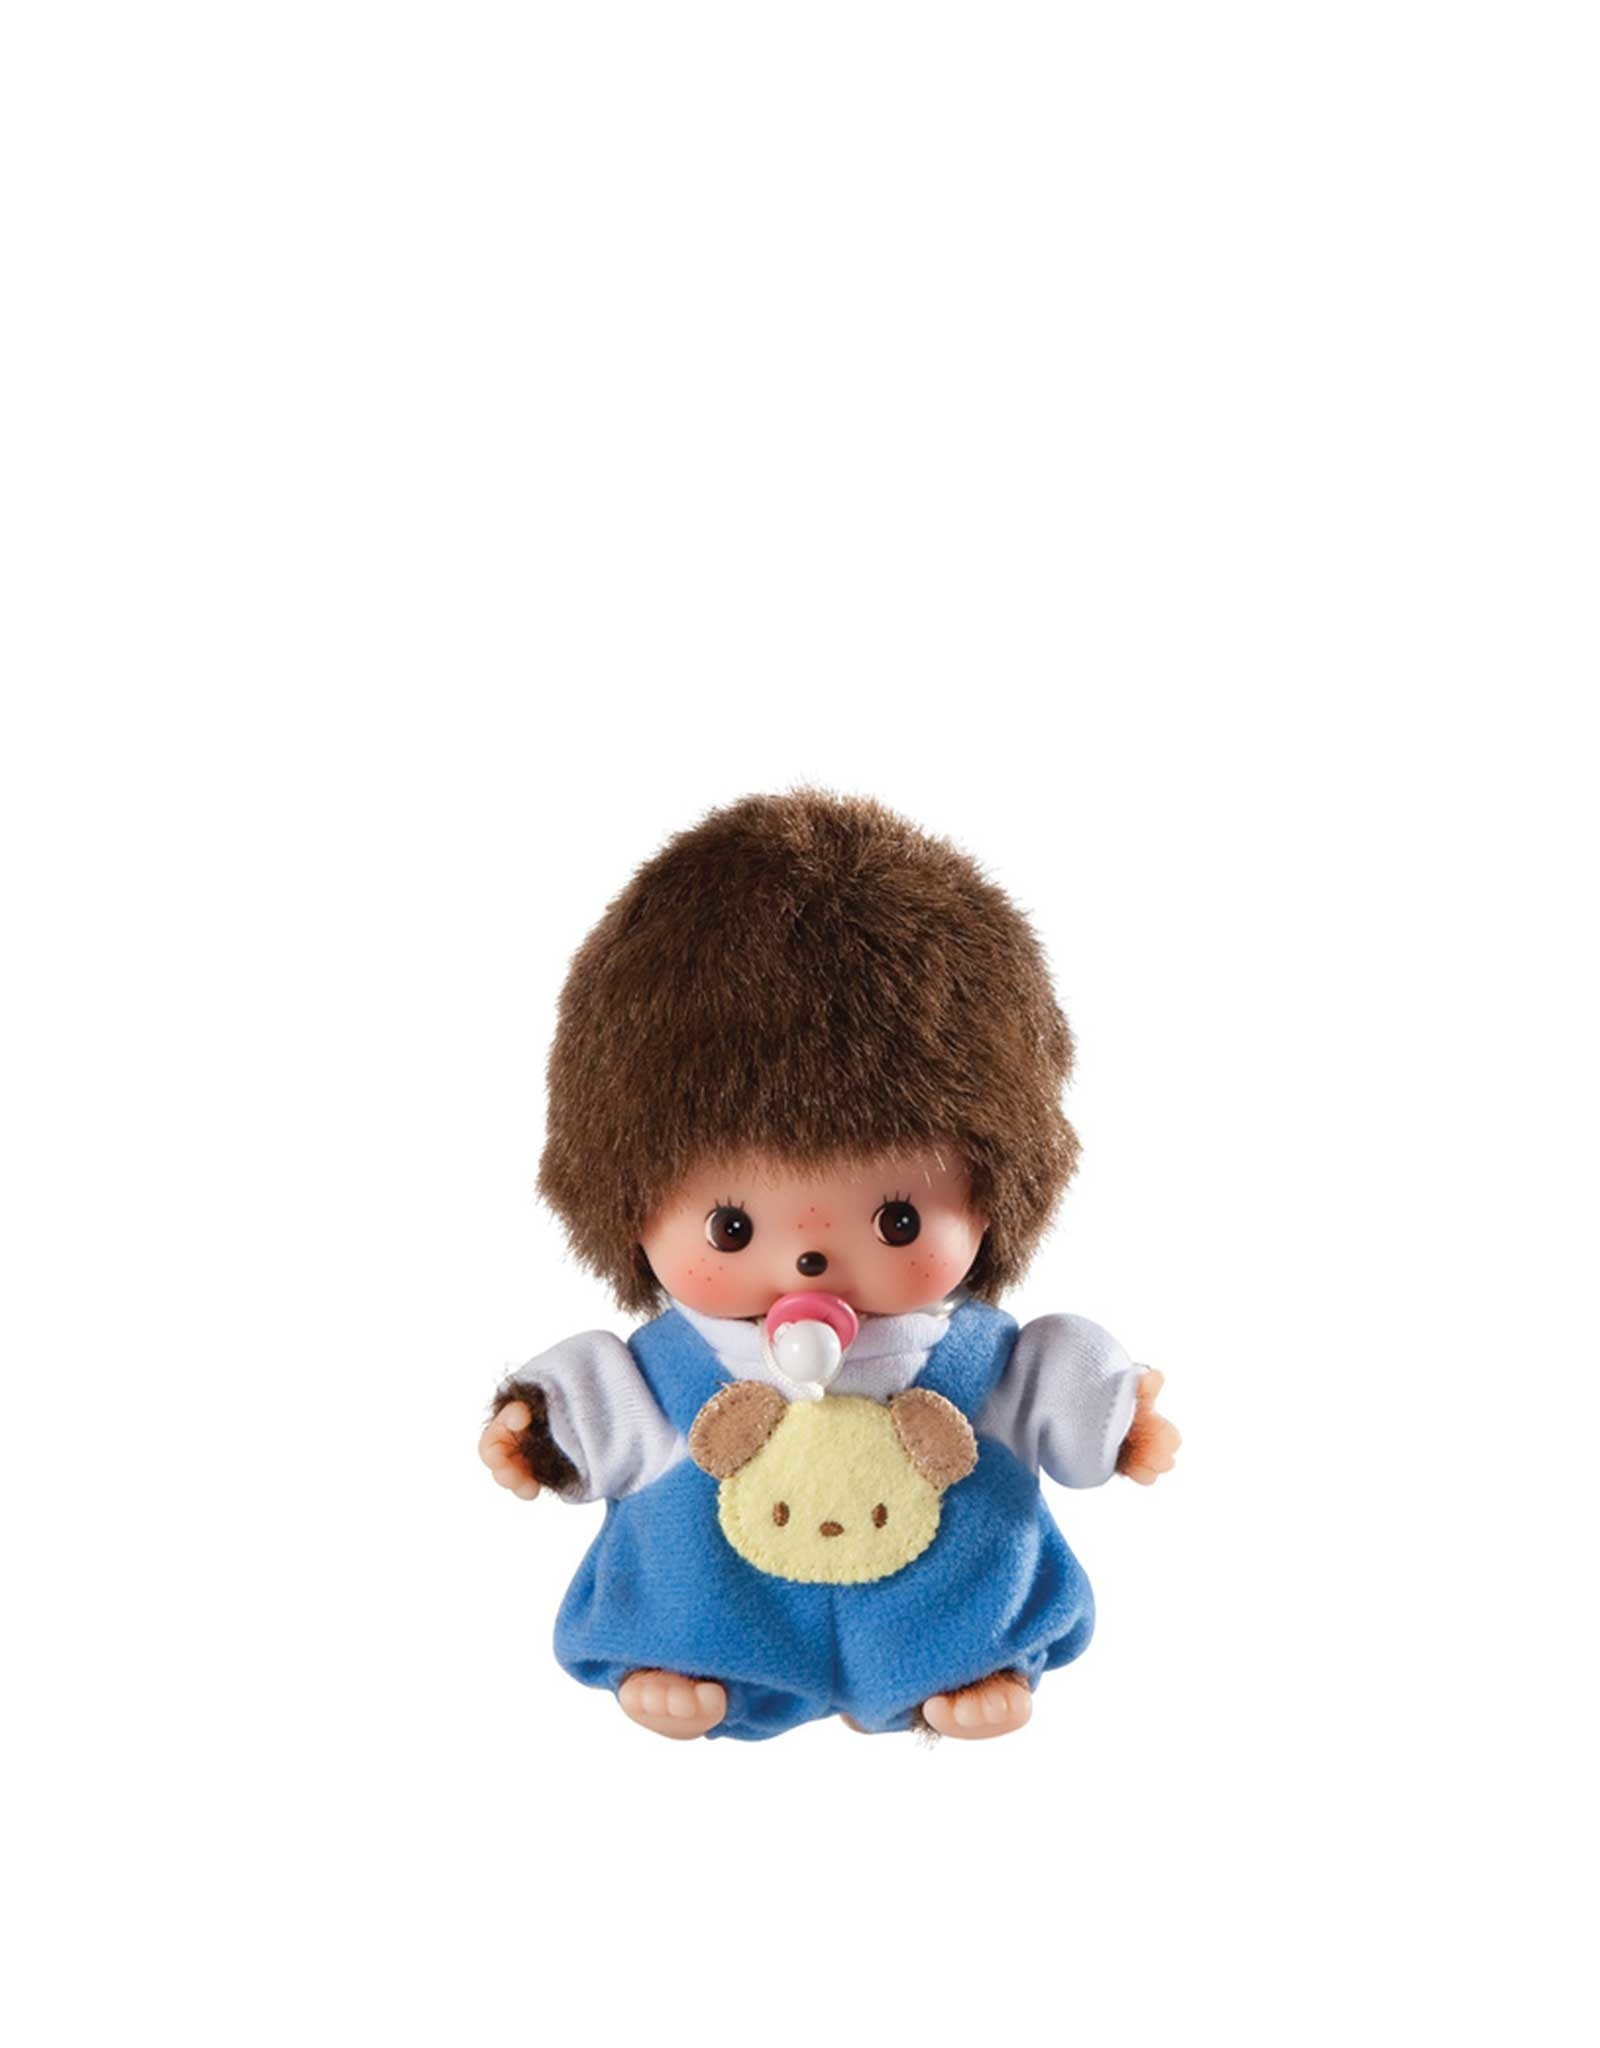 Monchhichi Bebichhichi - Bébé garçon avec salopette bleue